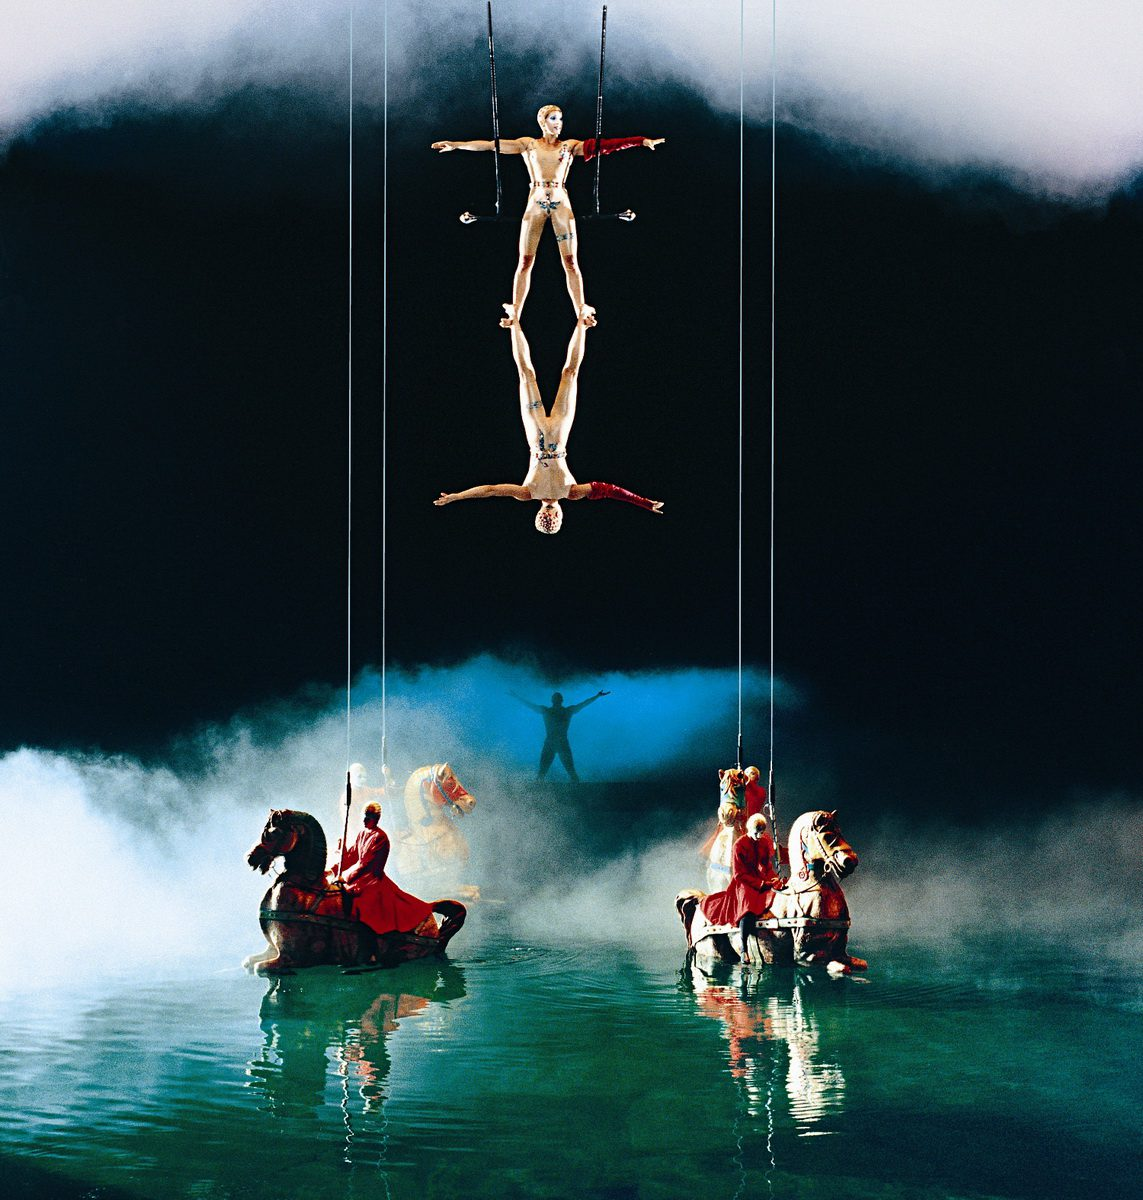 O by Cirque du Soleil - Trapeze